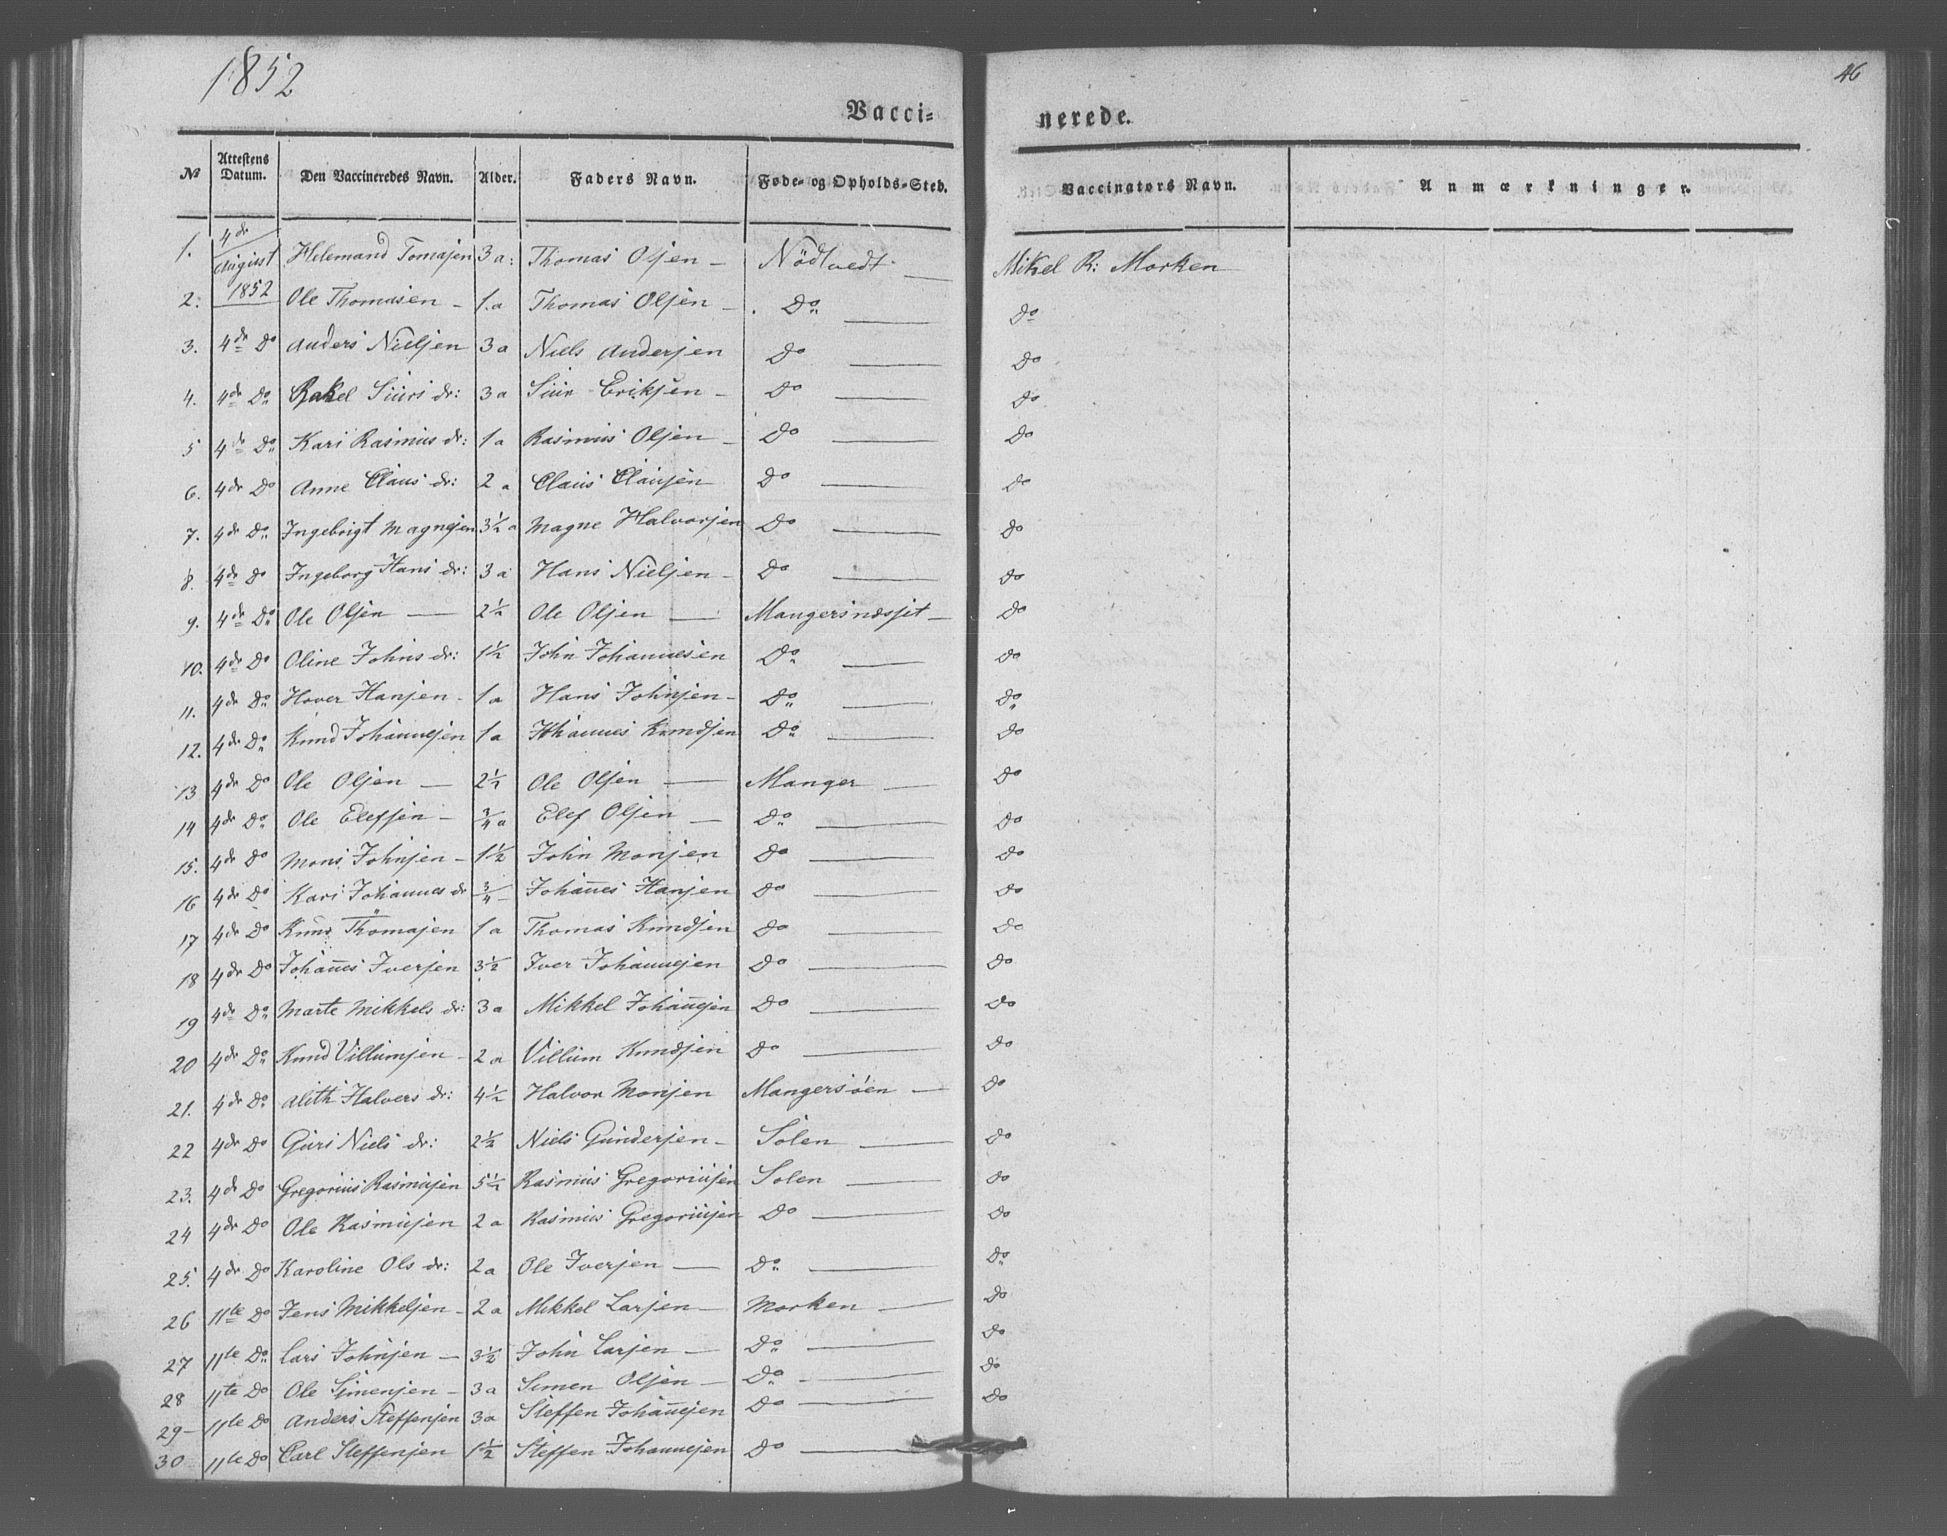 SAB, Manger sokneprestembete, H/Haa: Ministerialbok nr. A 10, 1844-1859, s. 46